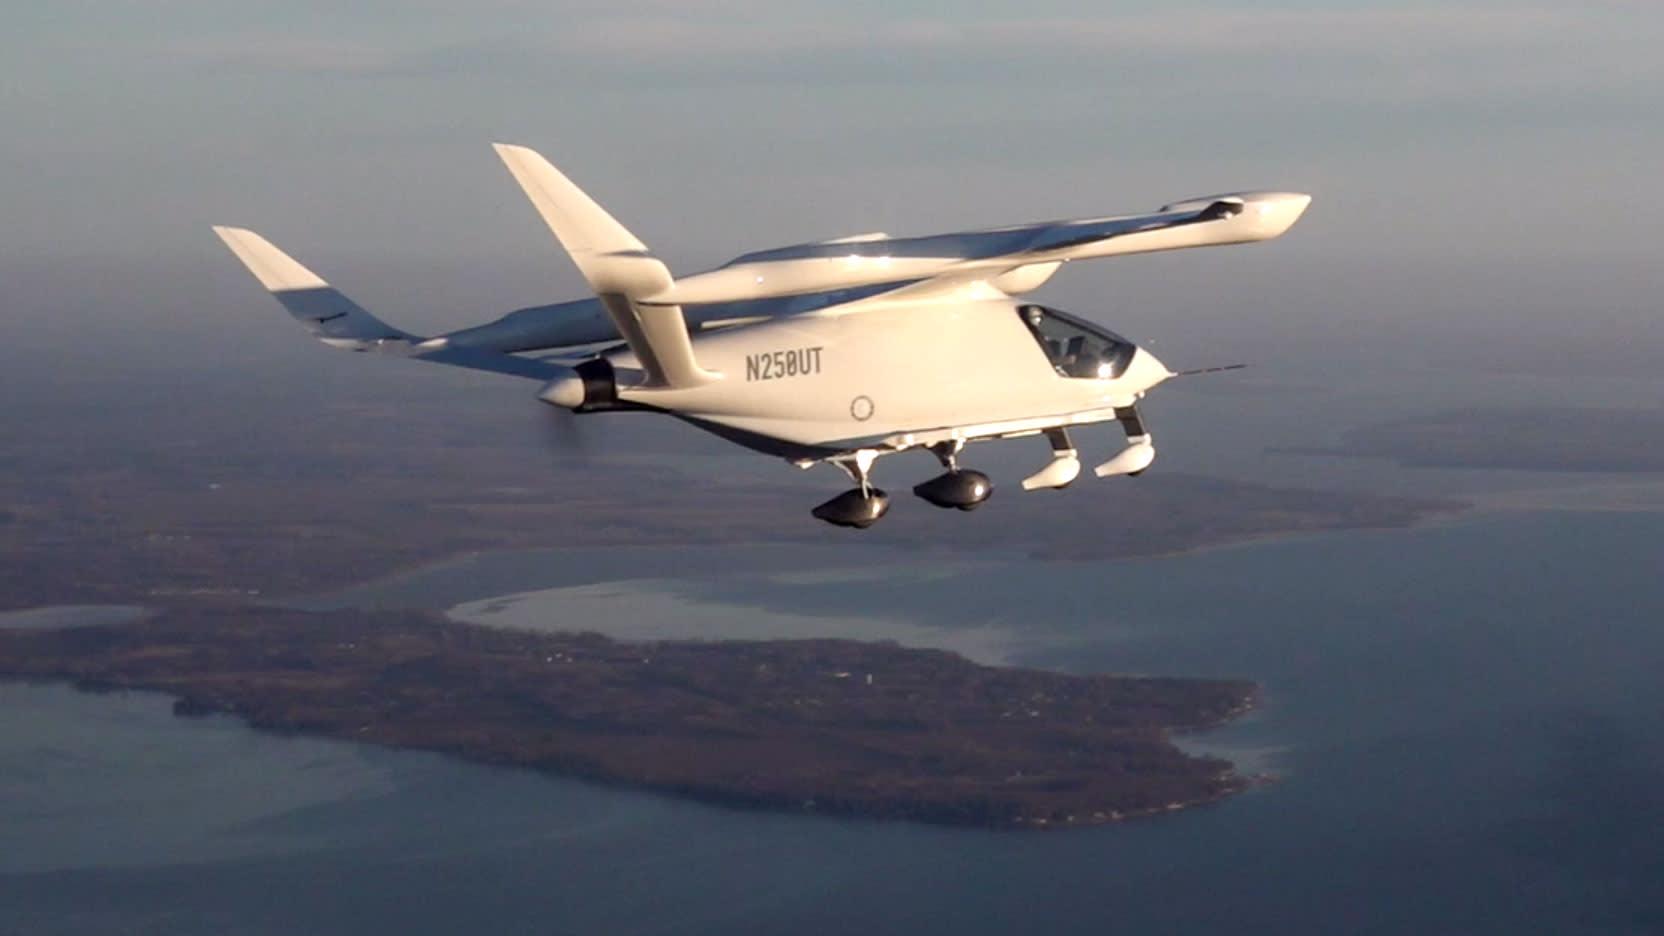 Beta hopes eVTOL aircraft deal with UPS validates new transport mode